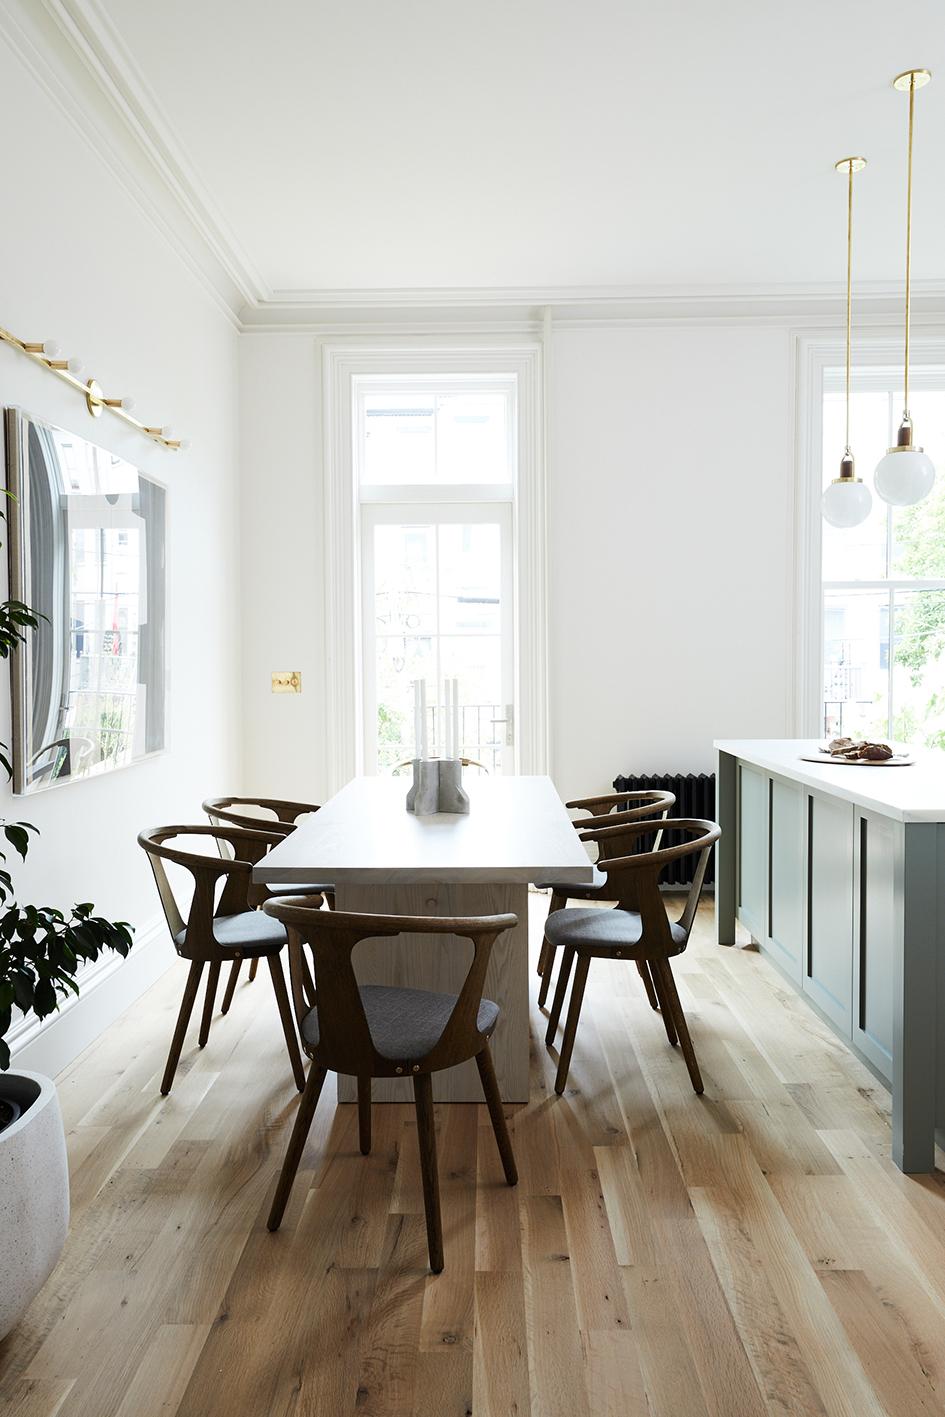 j. Dining Room Slope_Townhouse_Dining_Room_019.jpg